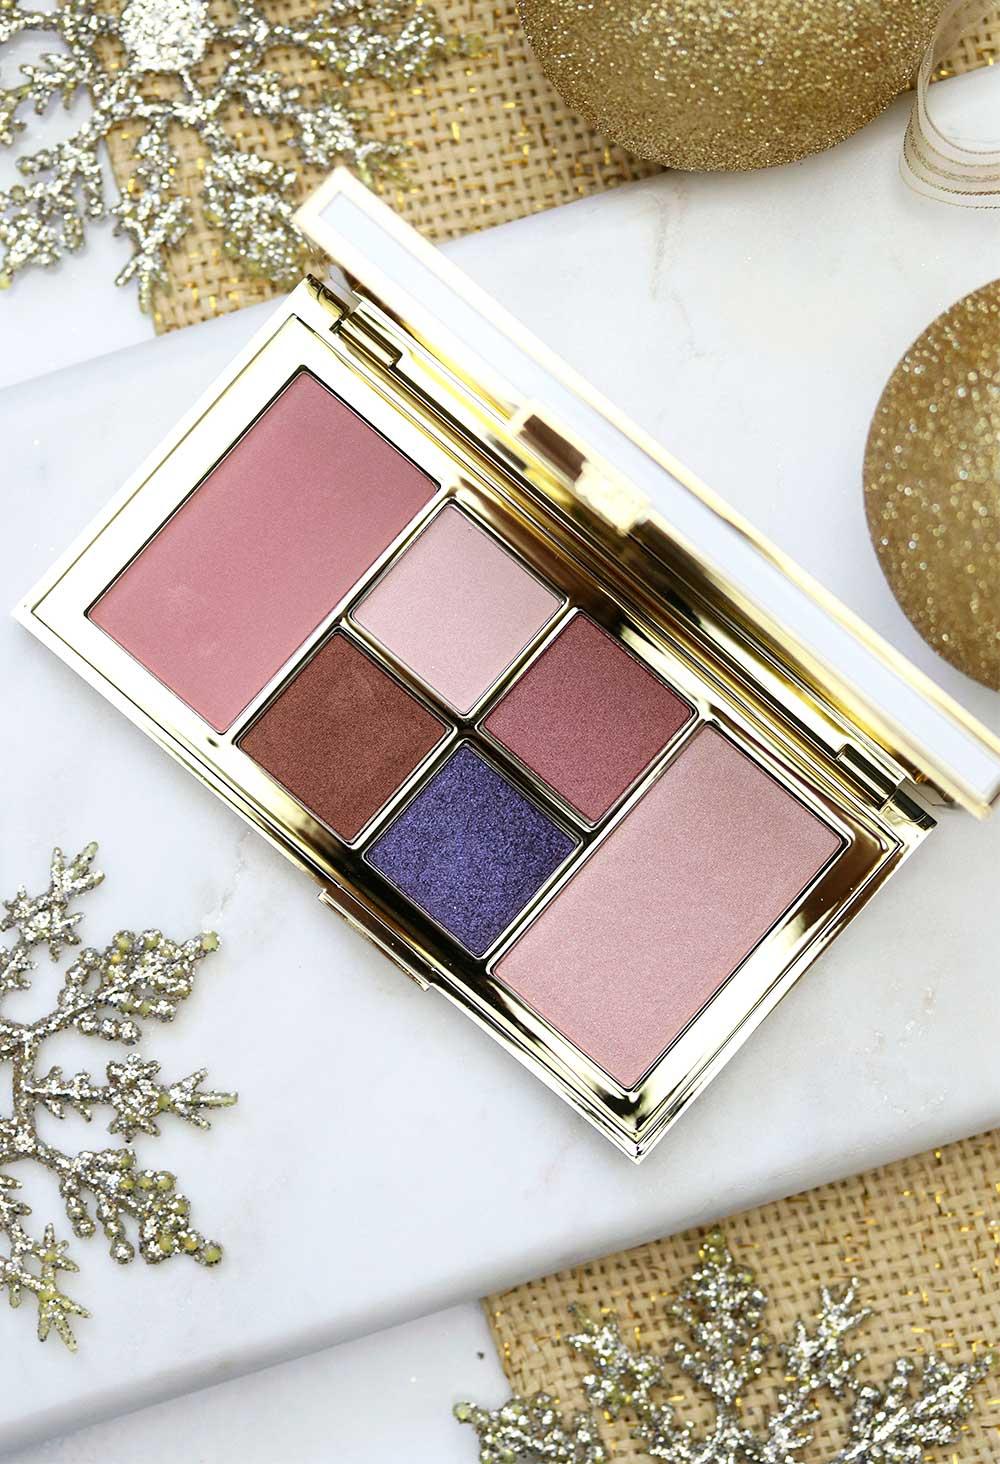 tom ford soleil eye cheek palette violette argente 2